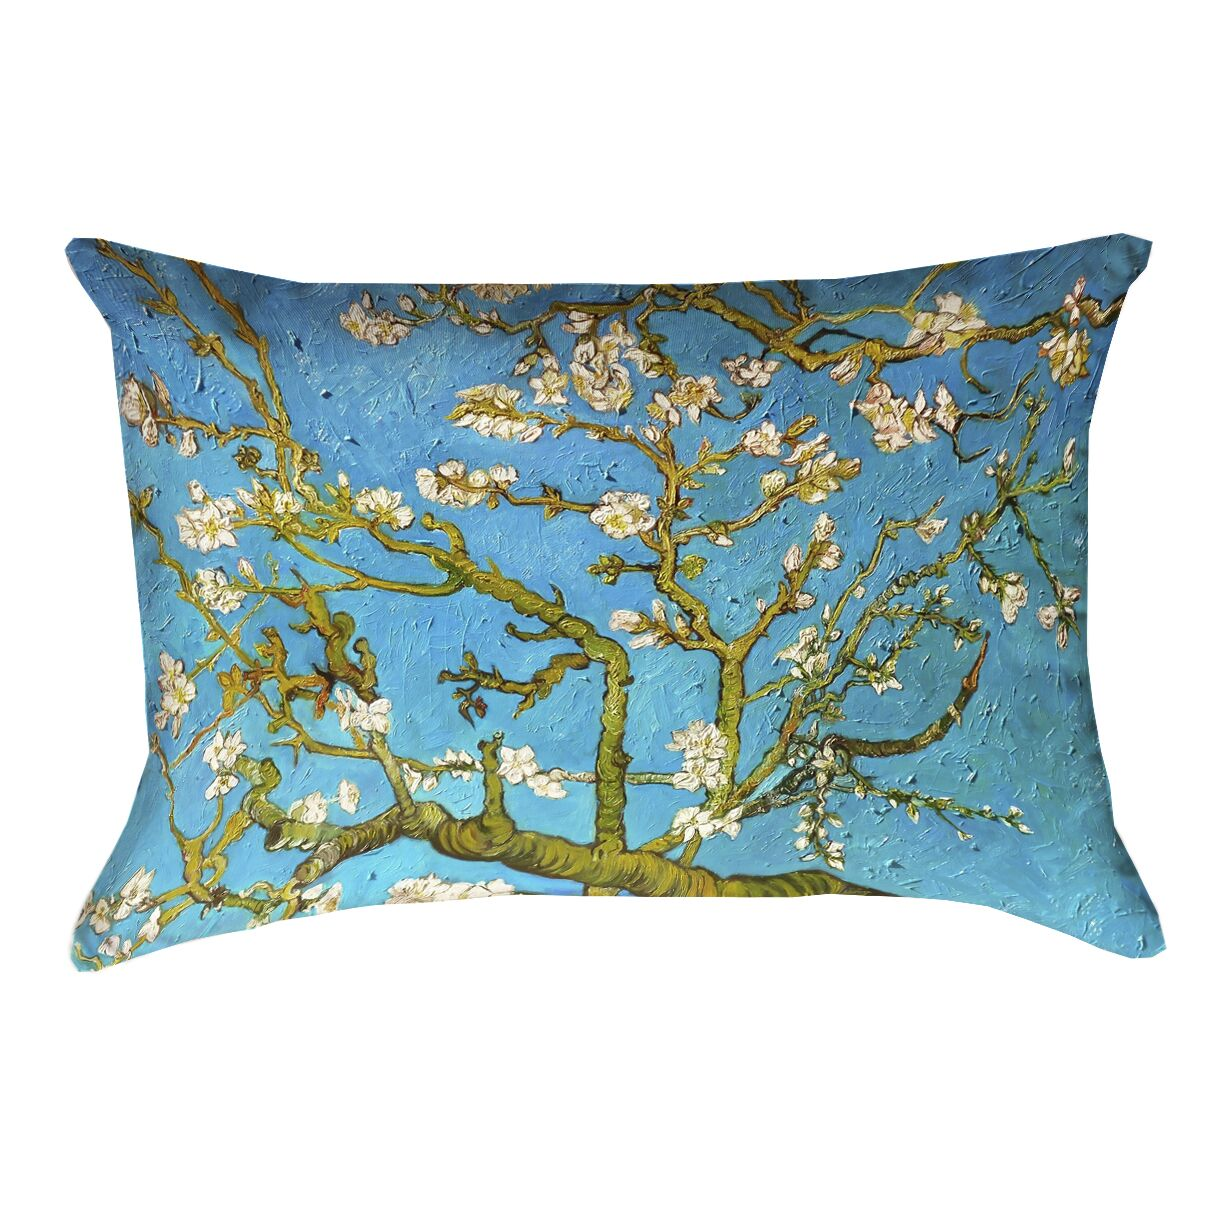 Lei Almond Blossom Linen Lumbar Pillow Color: Blue/Yellow